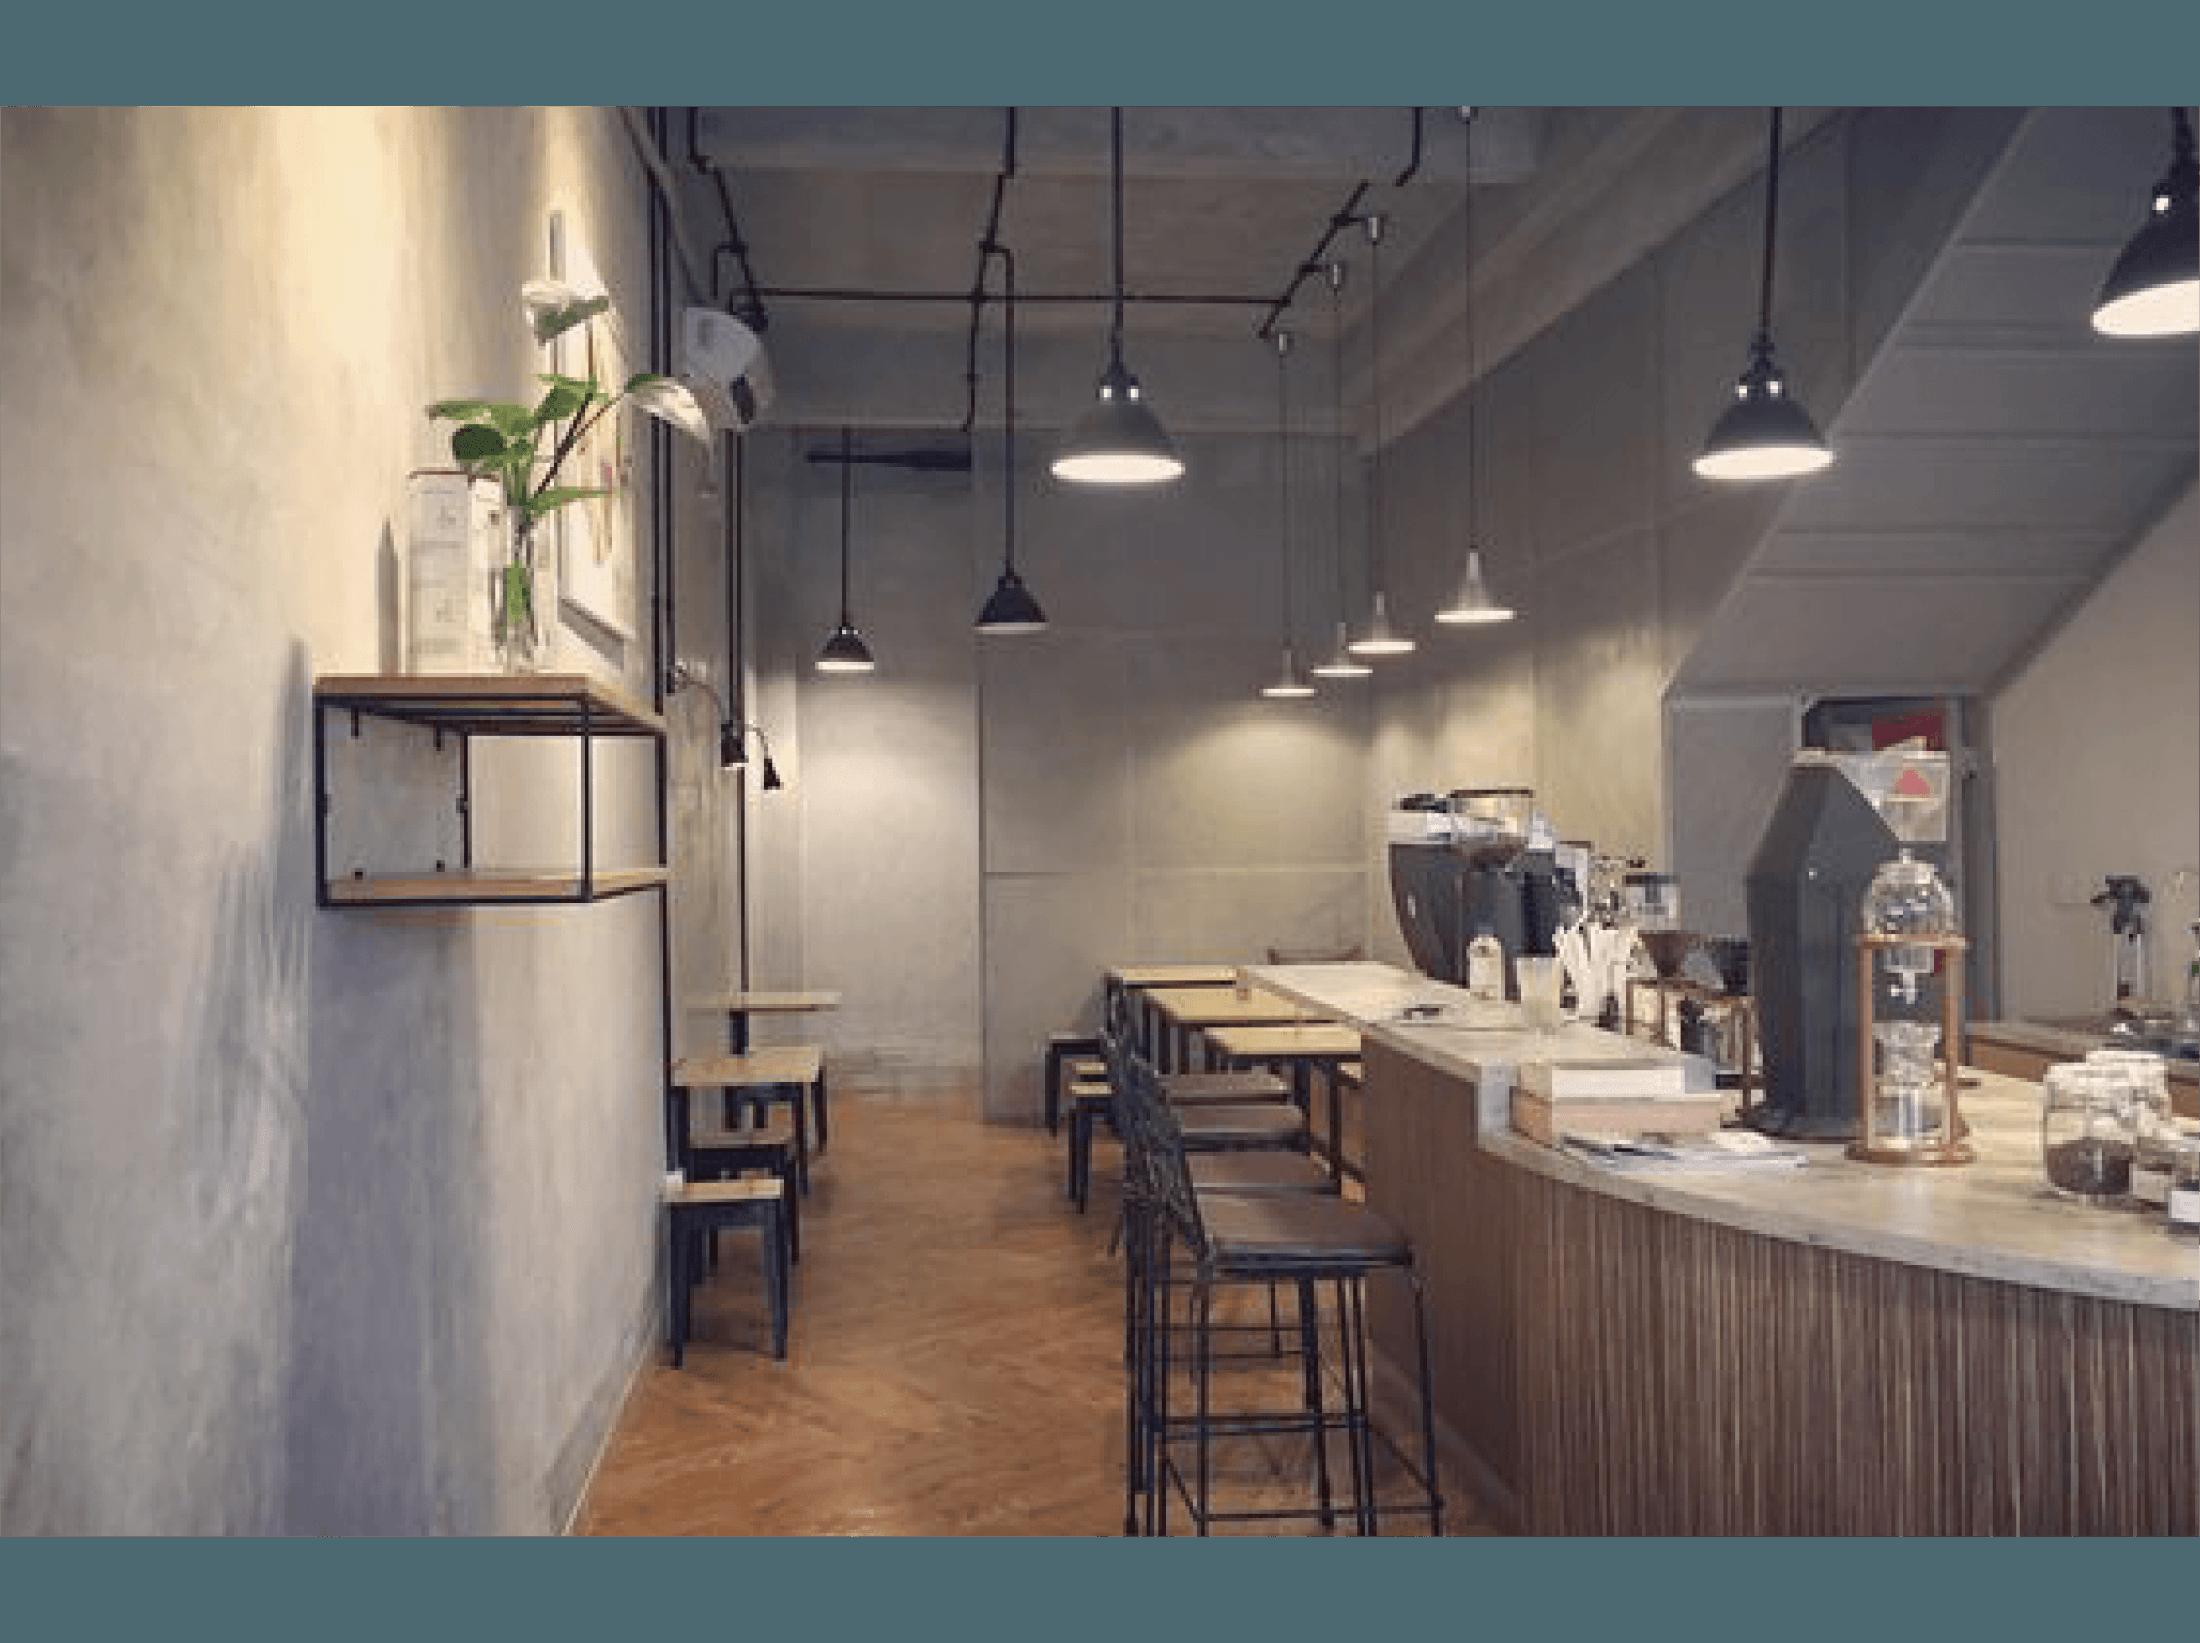 Sylvan Interior Design & Build Emmetropia Coffee Serpong, Kota Tangerang Selatan, Banten, Indonesia Serpong, Kota Tangerang Selatan, Banten, Indonesia Sylvan-Interior-Design-Emmetropia-Coffee  83357